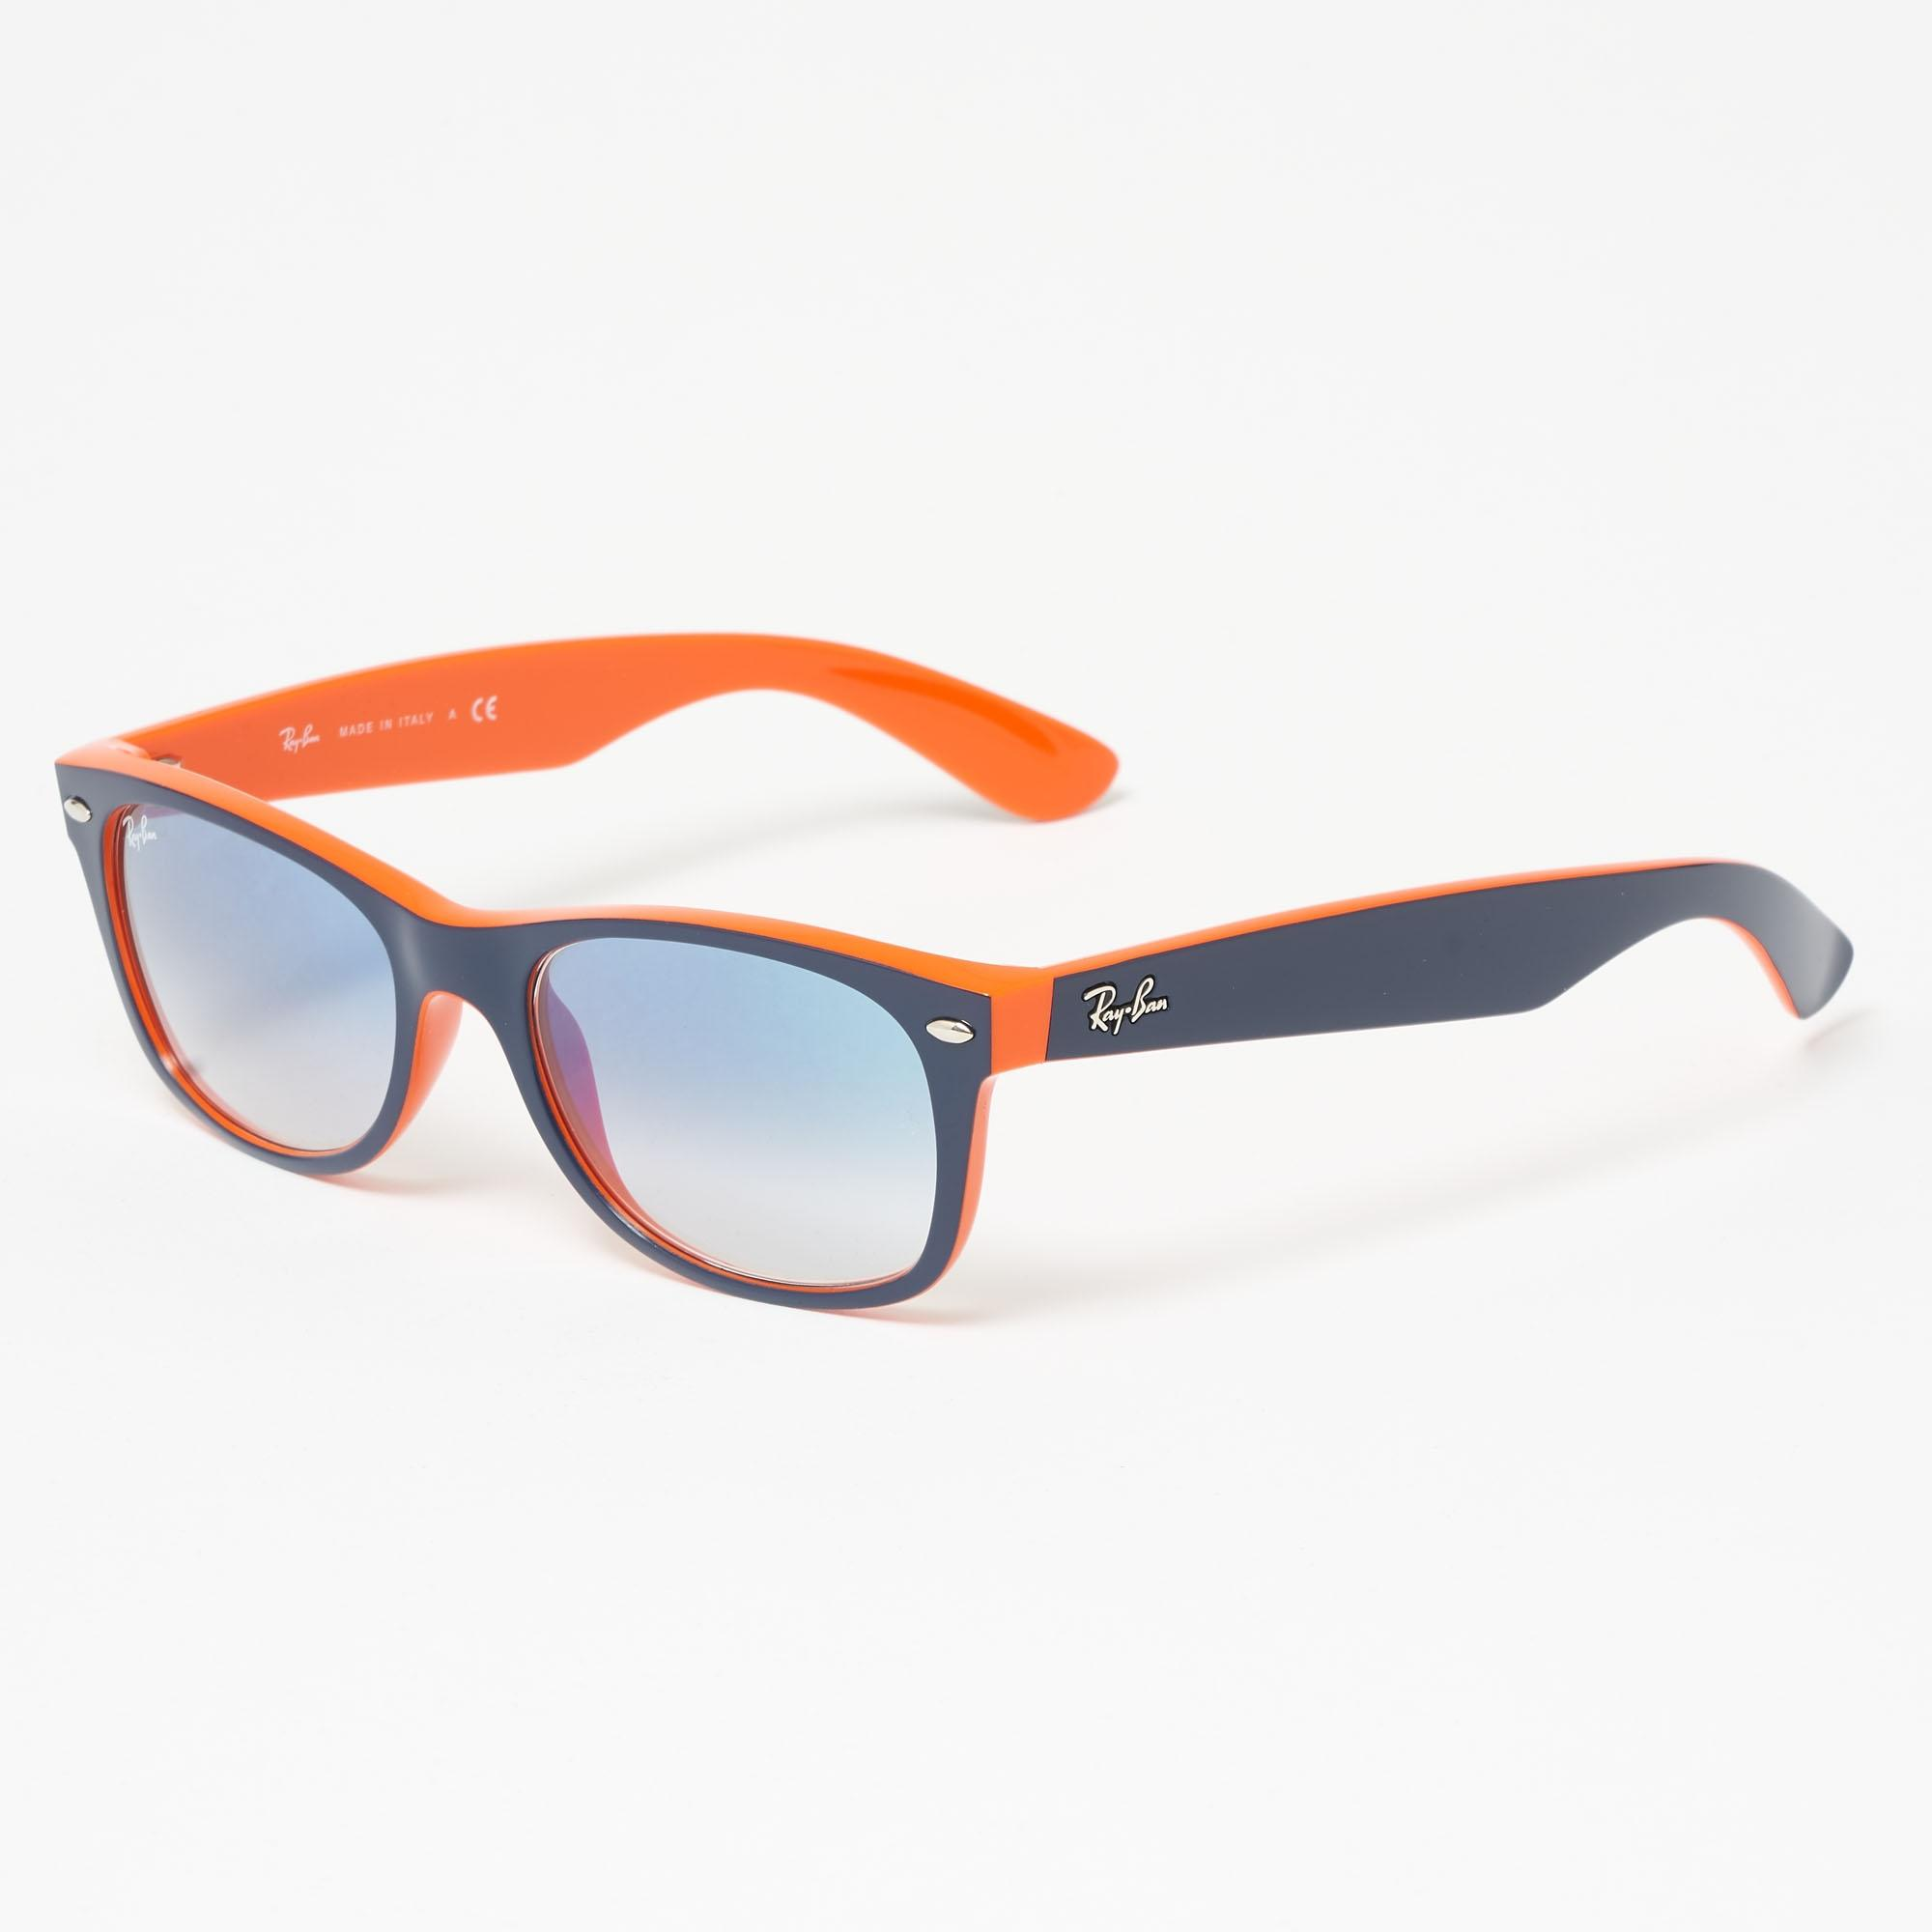 066d7703b9 ... wholesale lyst ray ban blue orange new wayfarer colour mix light blue  69a0f b1791